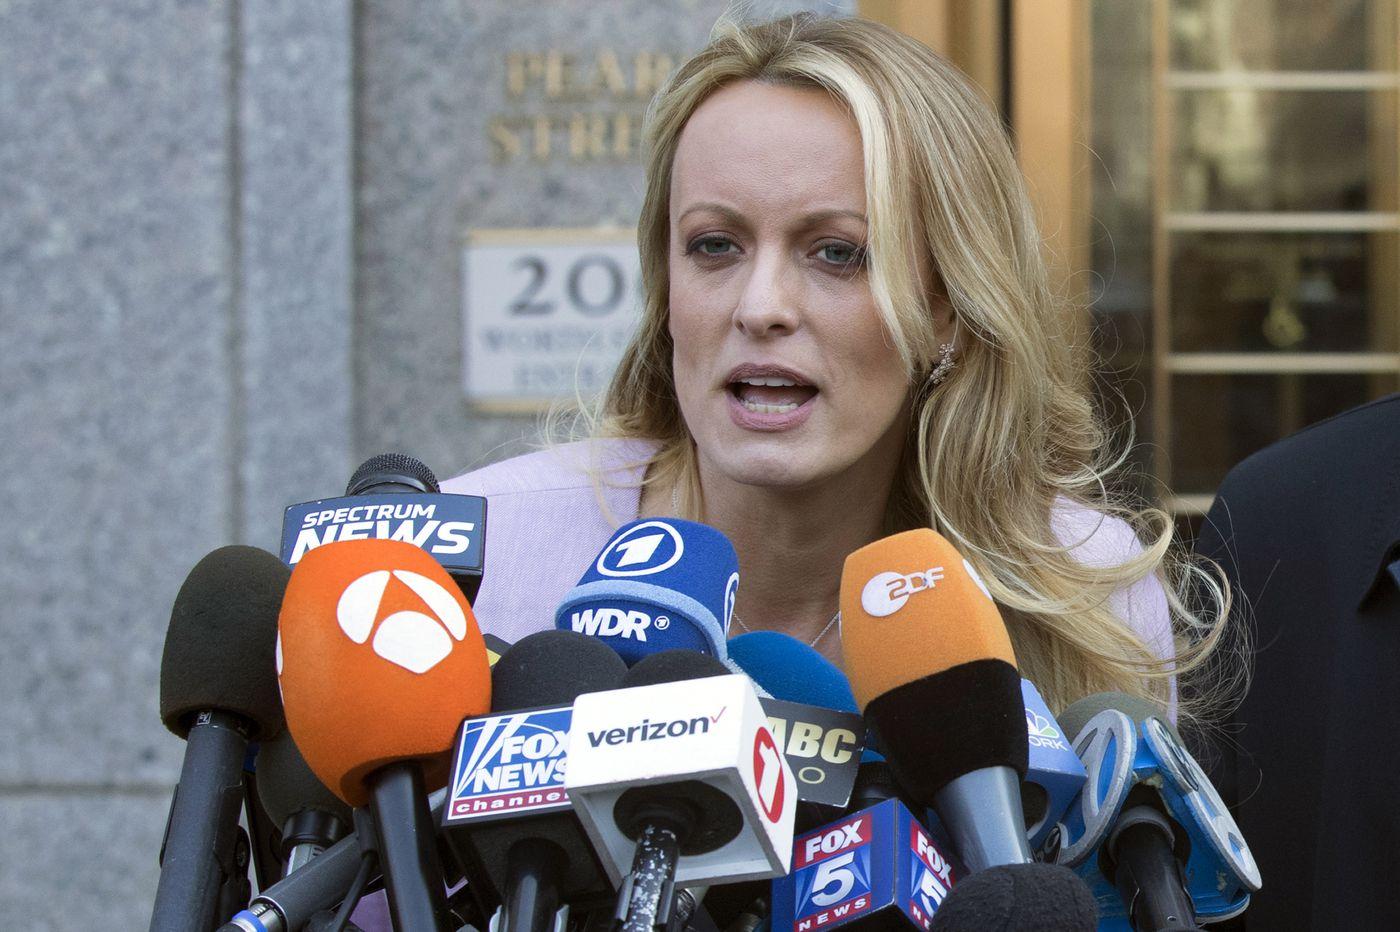 Stormy Daniels settles suit against Michael Cohen in hush-money scandal